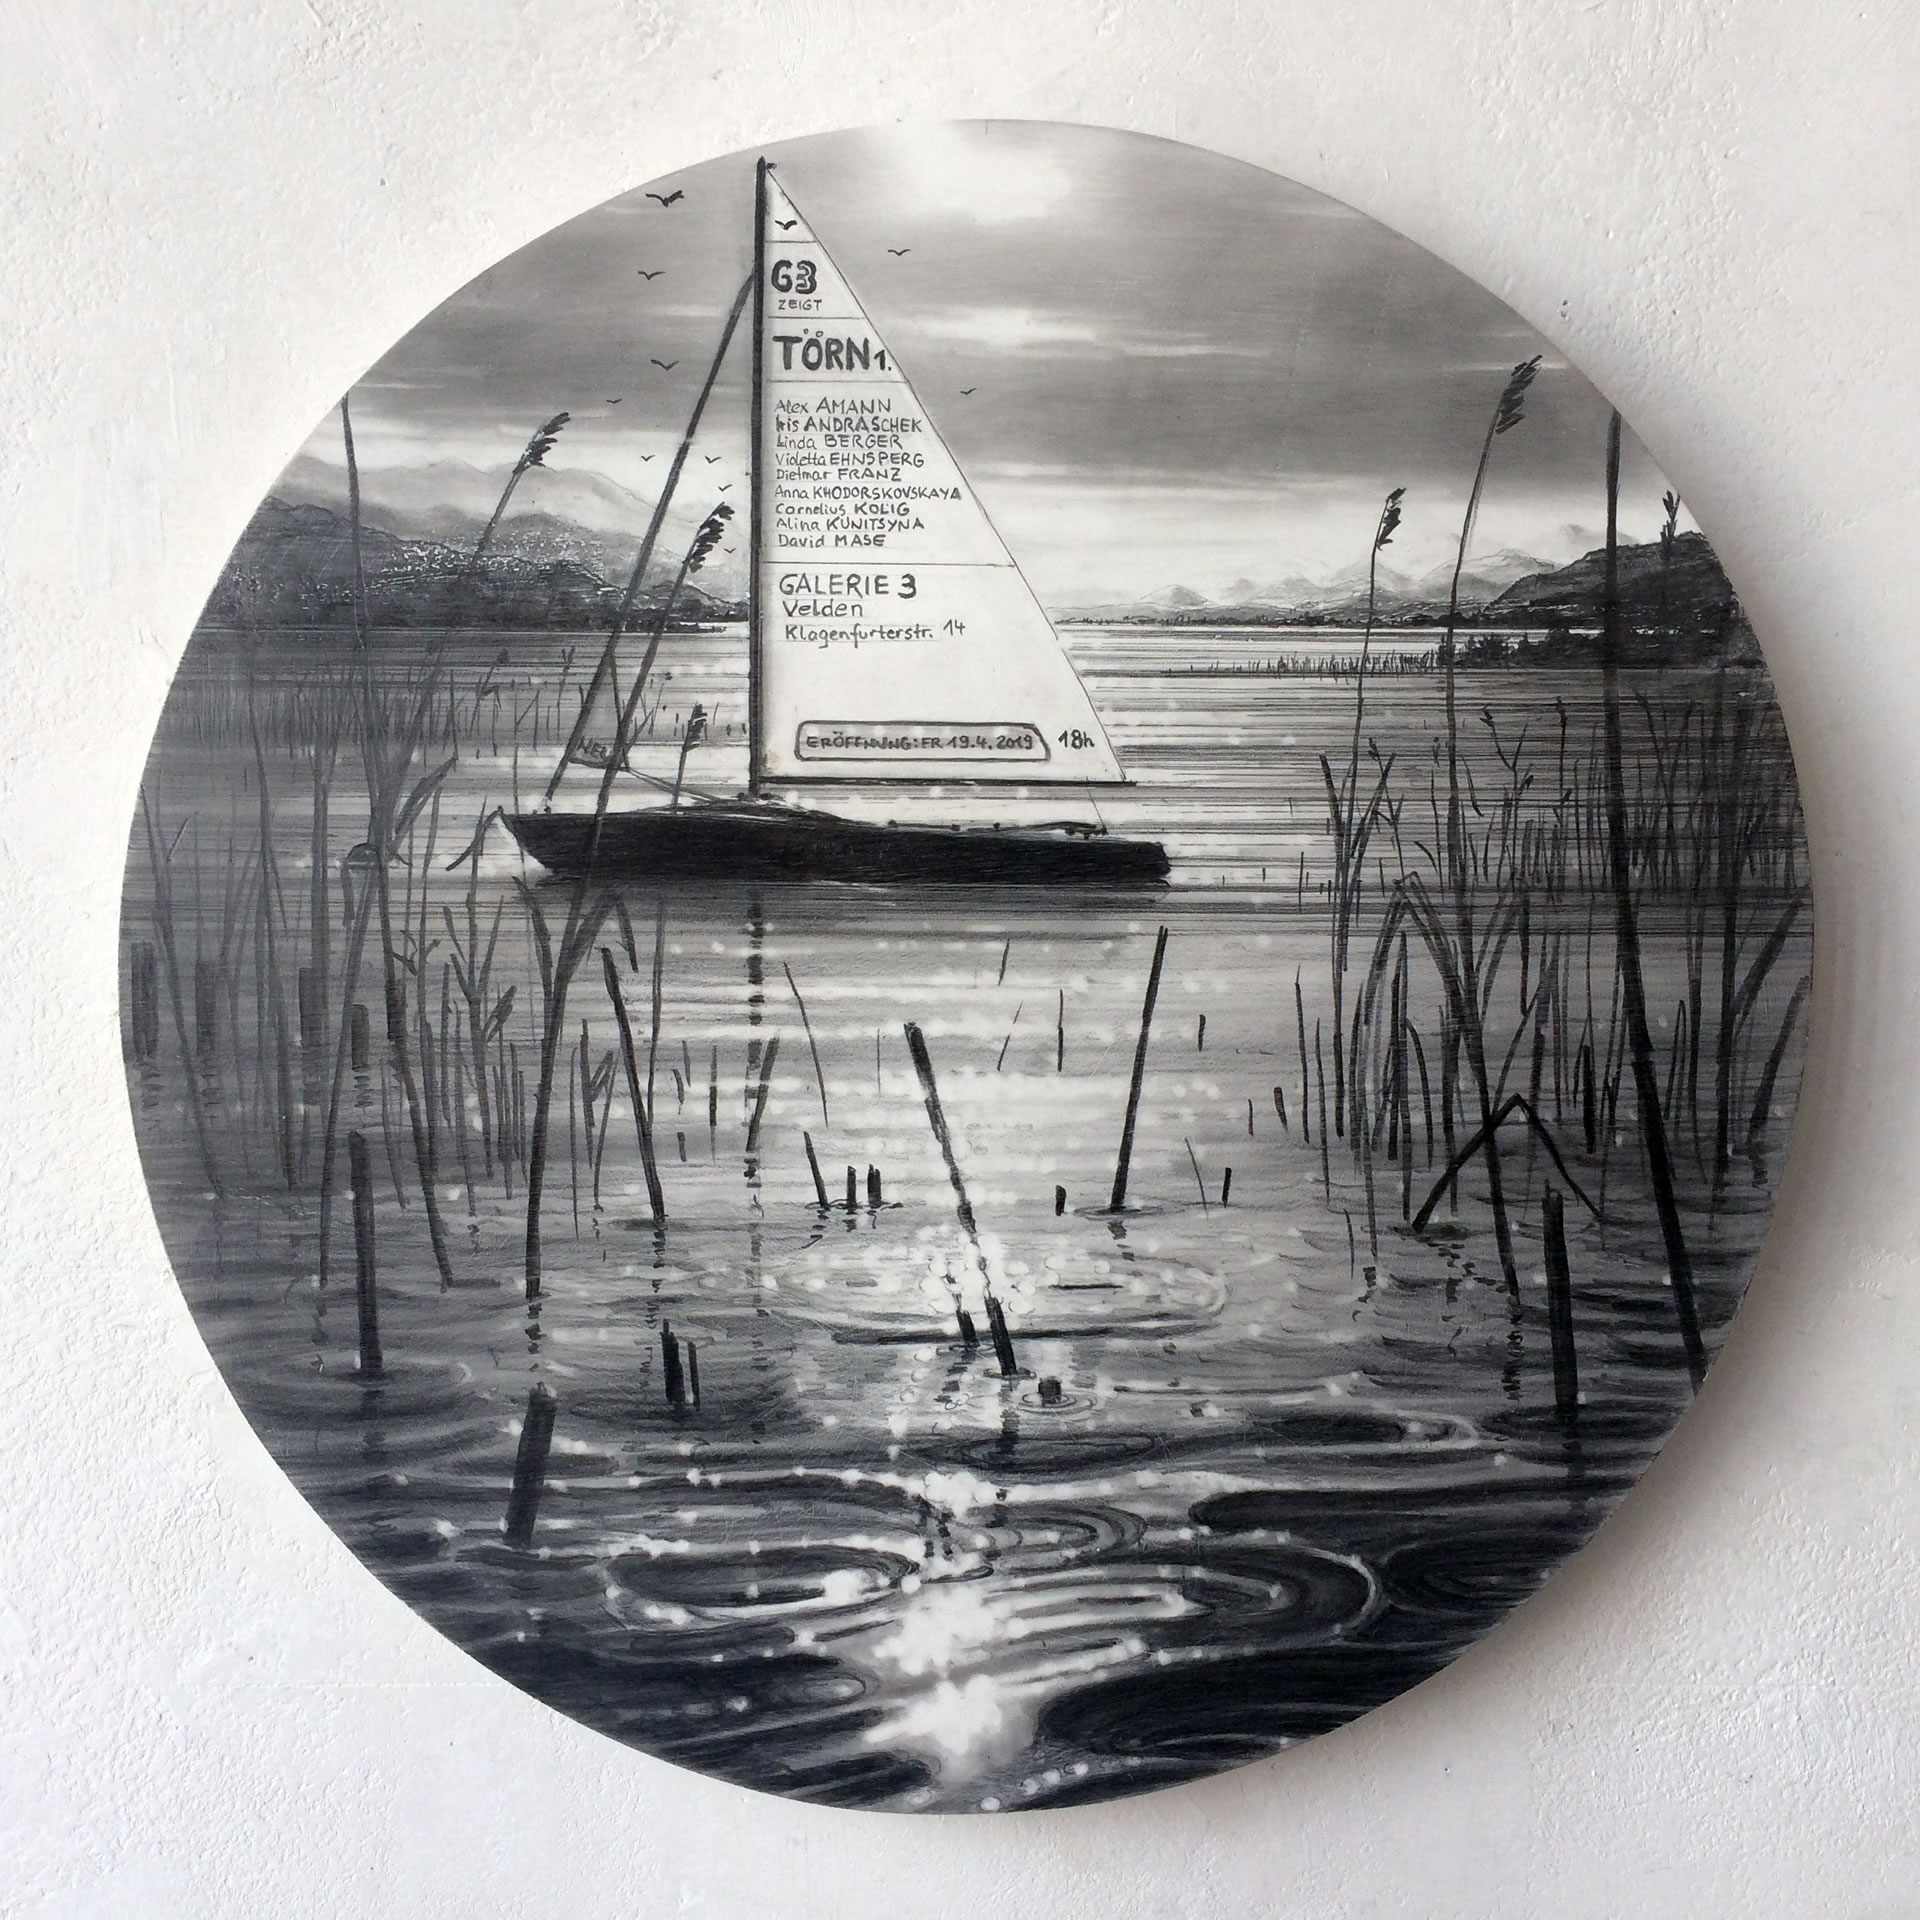 Dietmar Franz | 1. Törn Segelboot | Galerie3 Velden